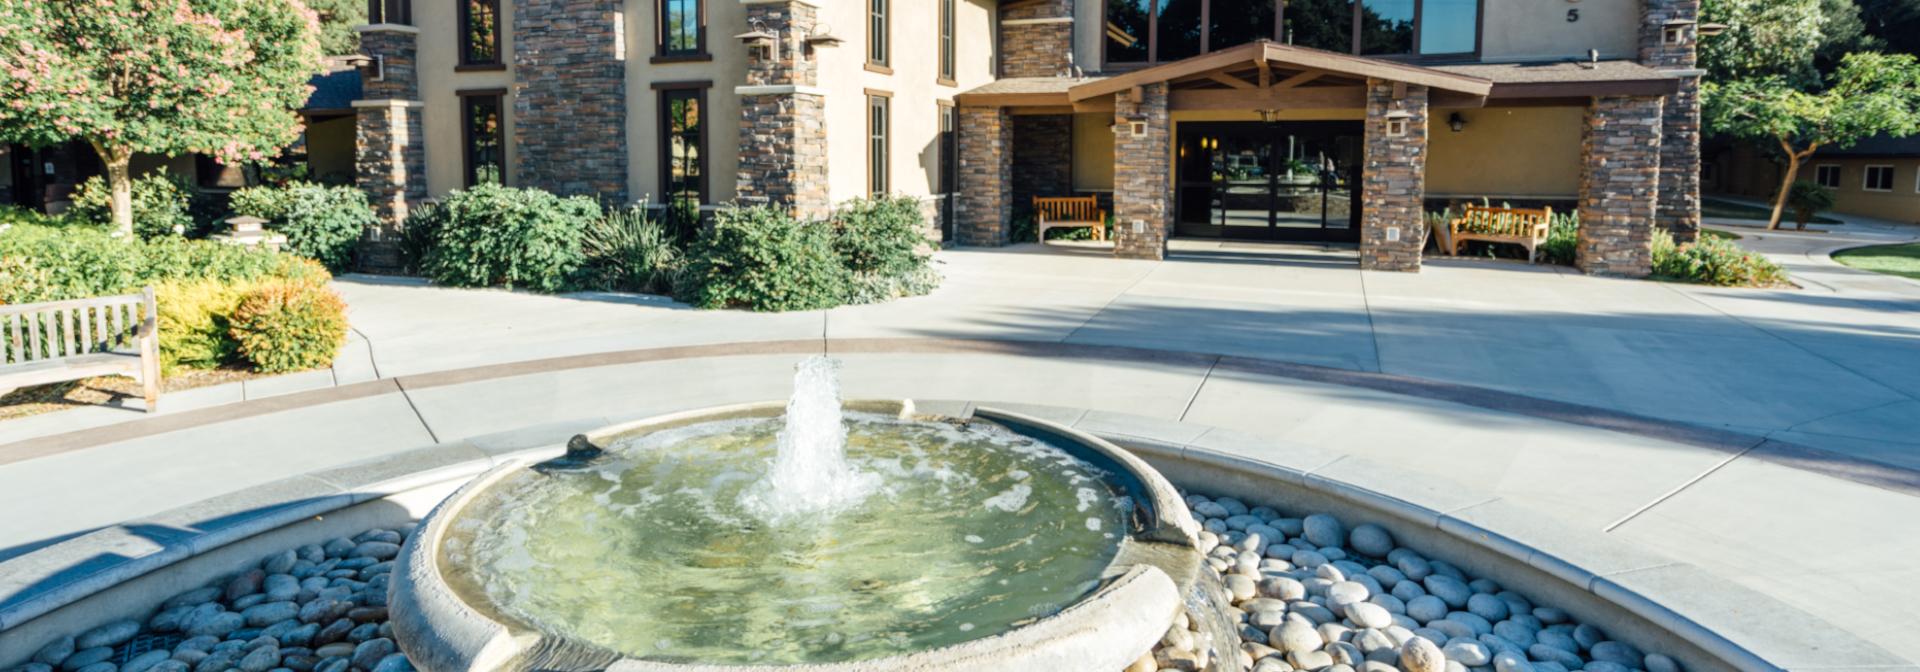 Water fountains masters - Water Fountains Masters 32